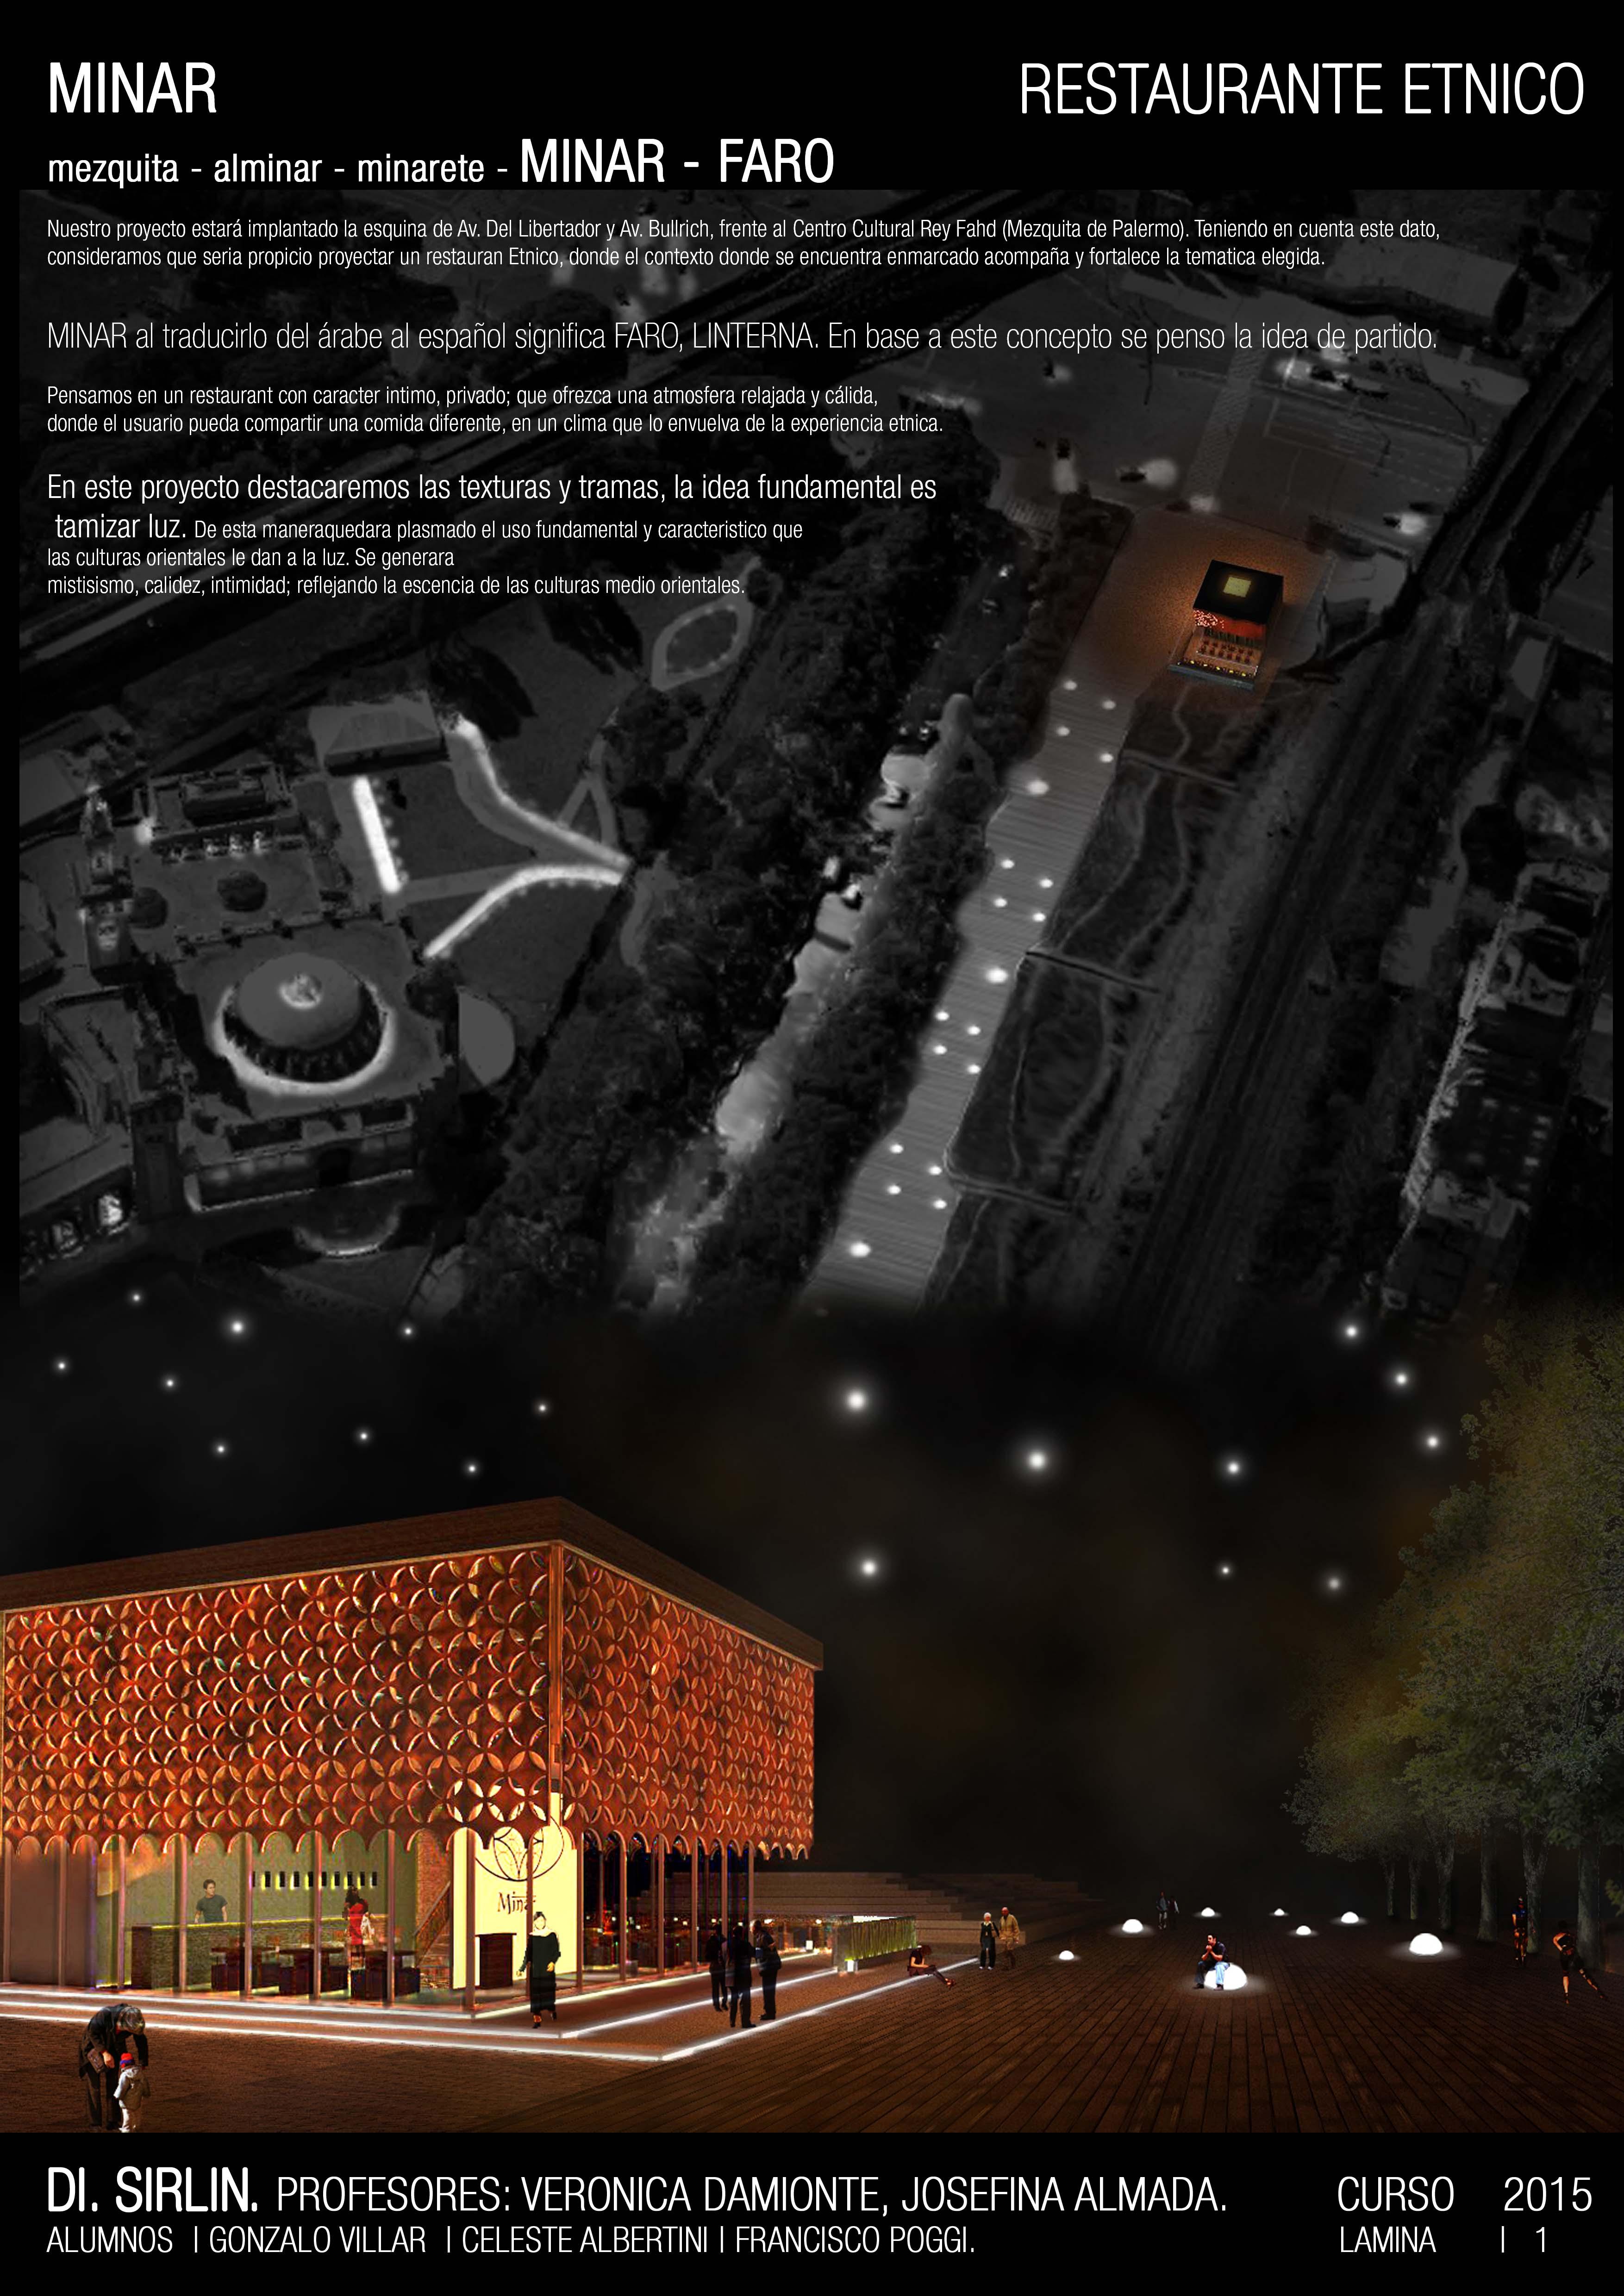 Restaurant tematico dise o iluminacion catedra sirlin - Iluminacion original ...